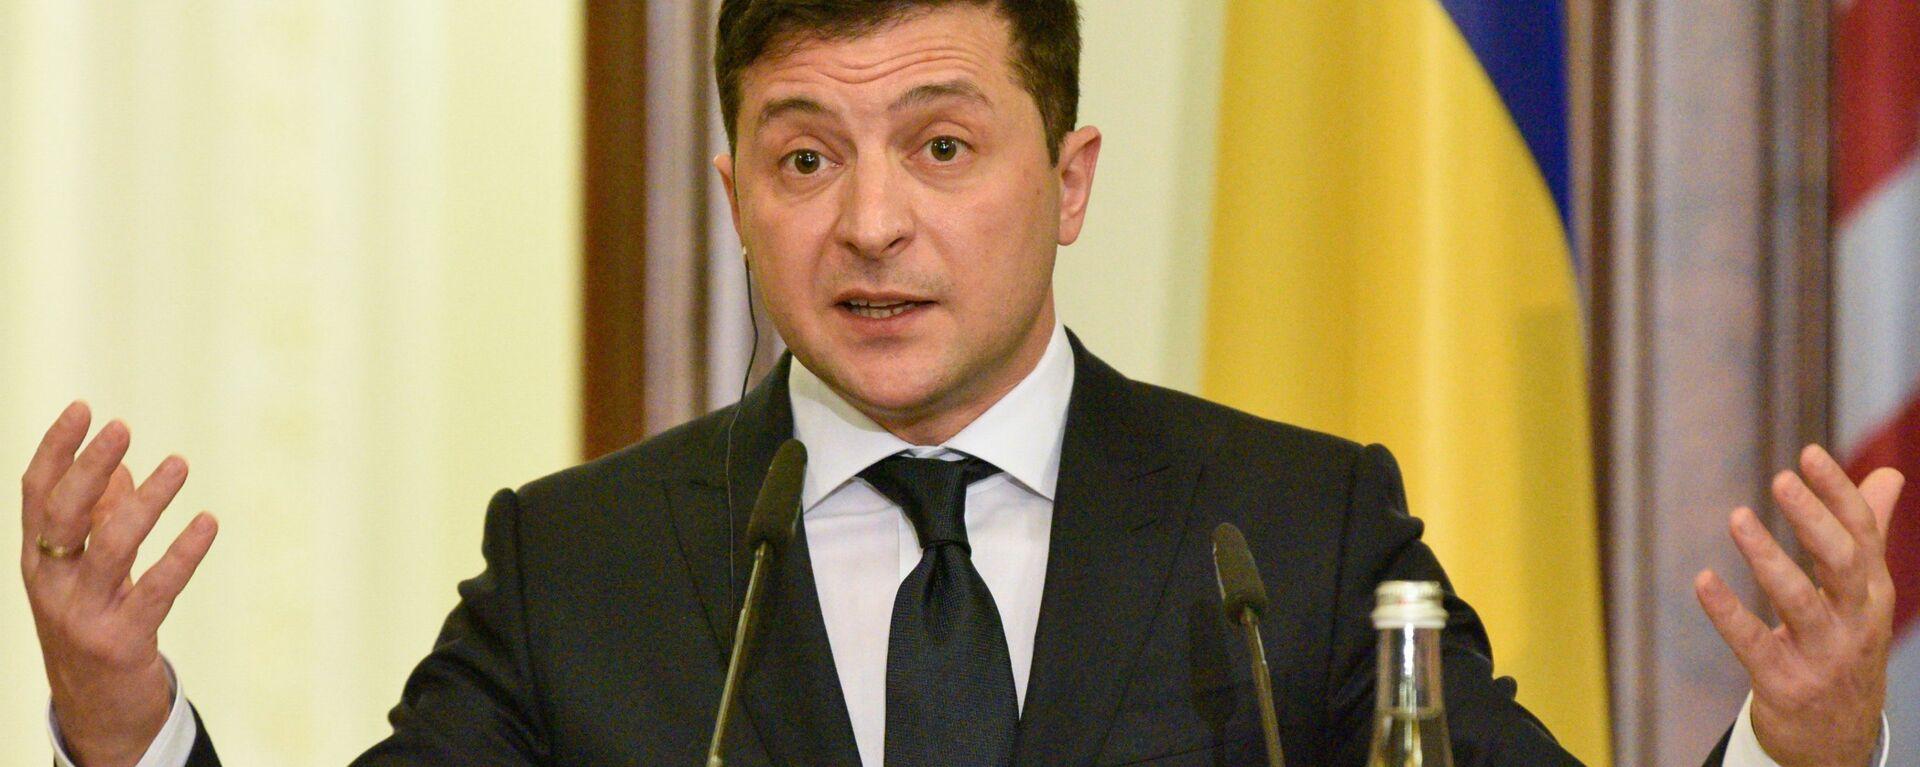 Volodímir Zelenski, presidente de Ucrania - Sputnik Mundo, 1920, 08.05.2021